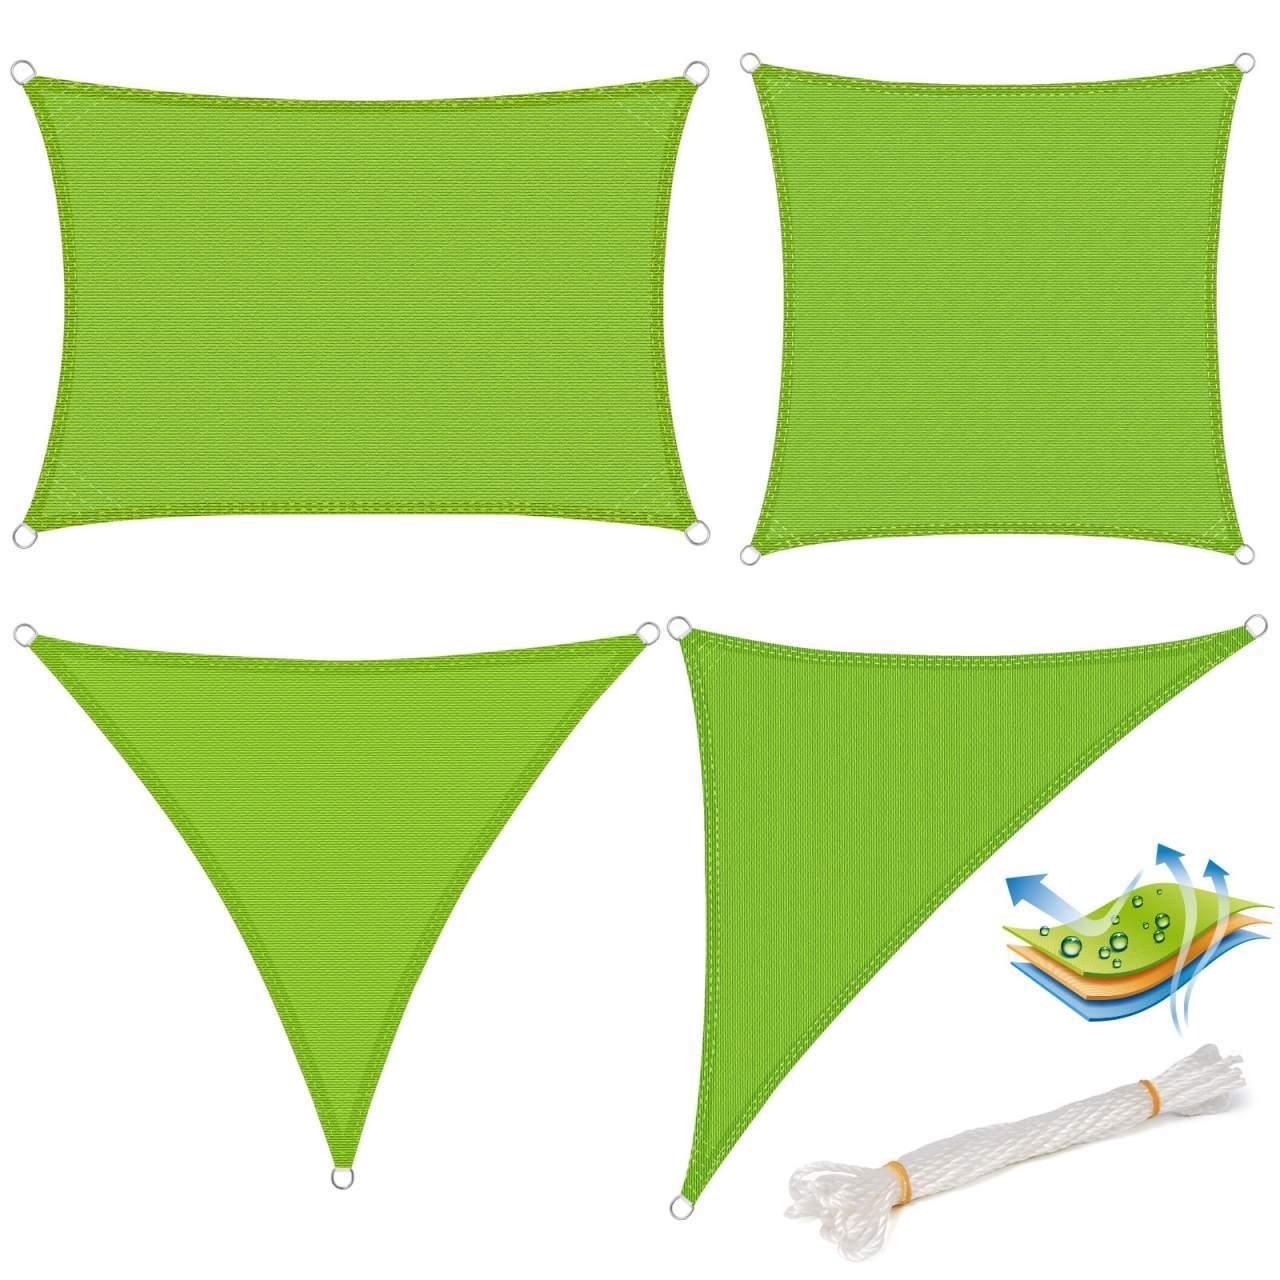 Sonnensegel Sonnenschutz HDPE Windschutz UV Schutz Gruen GZS1188gn01